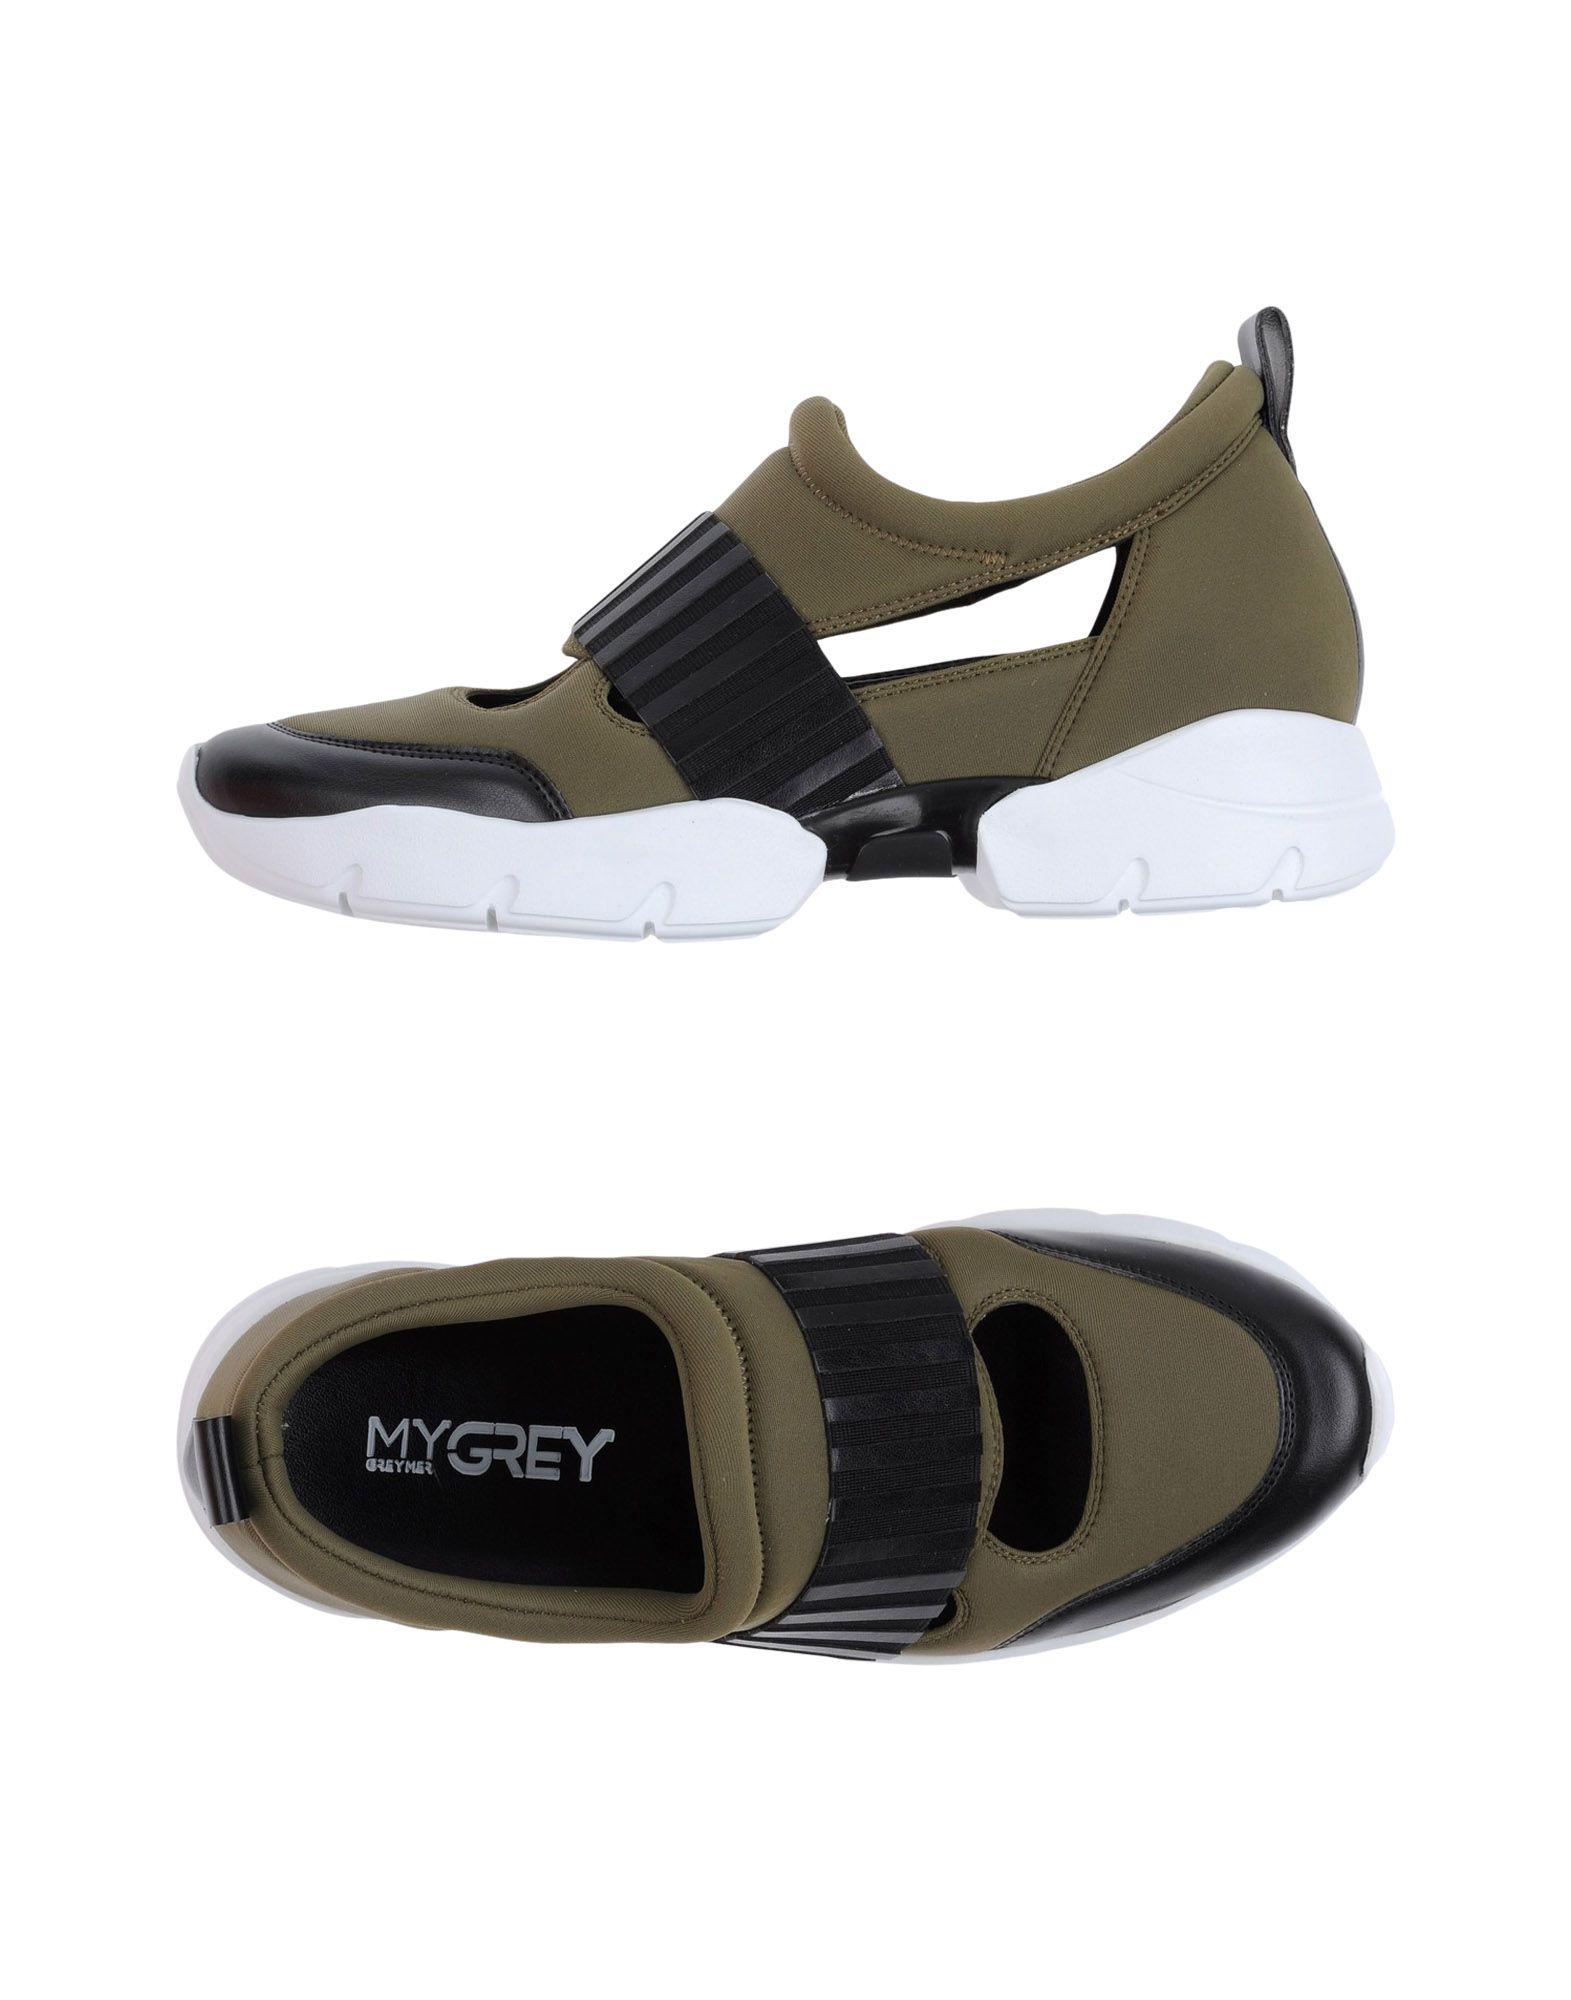 MY GREY Damen Low Sneakers & Tennisschuhe Farbe Militärgrün Größe 9